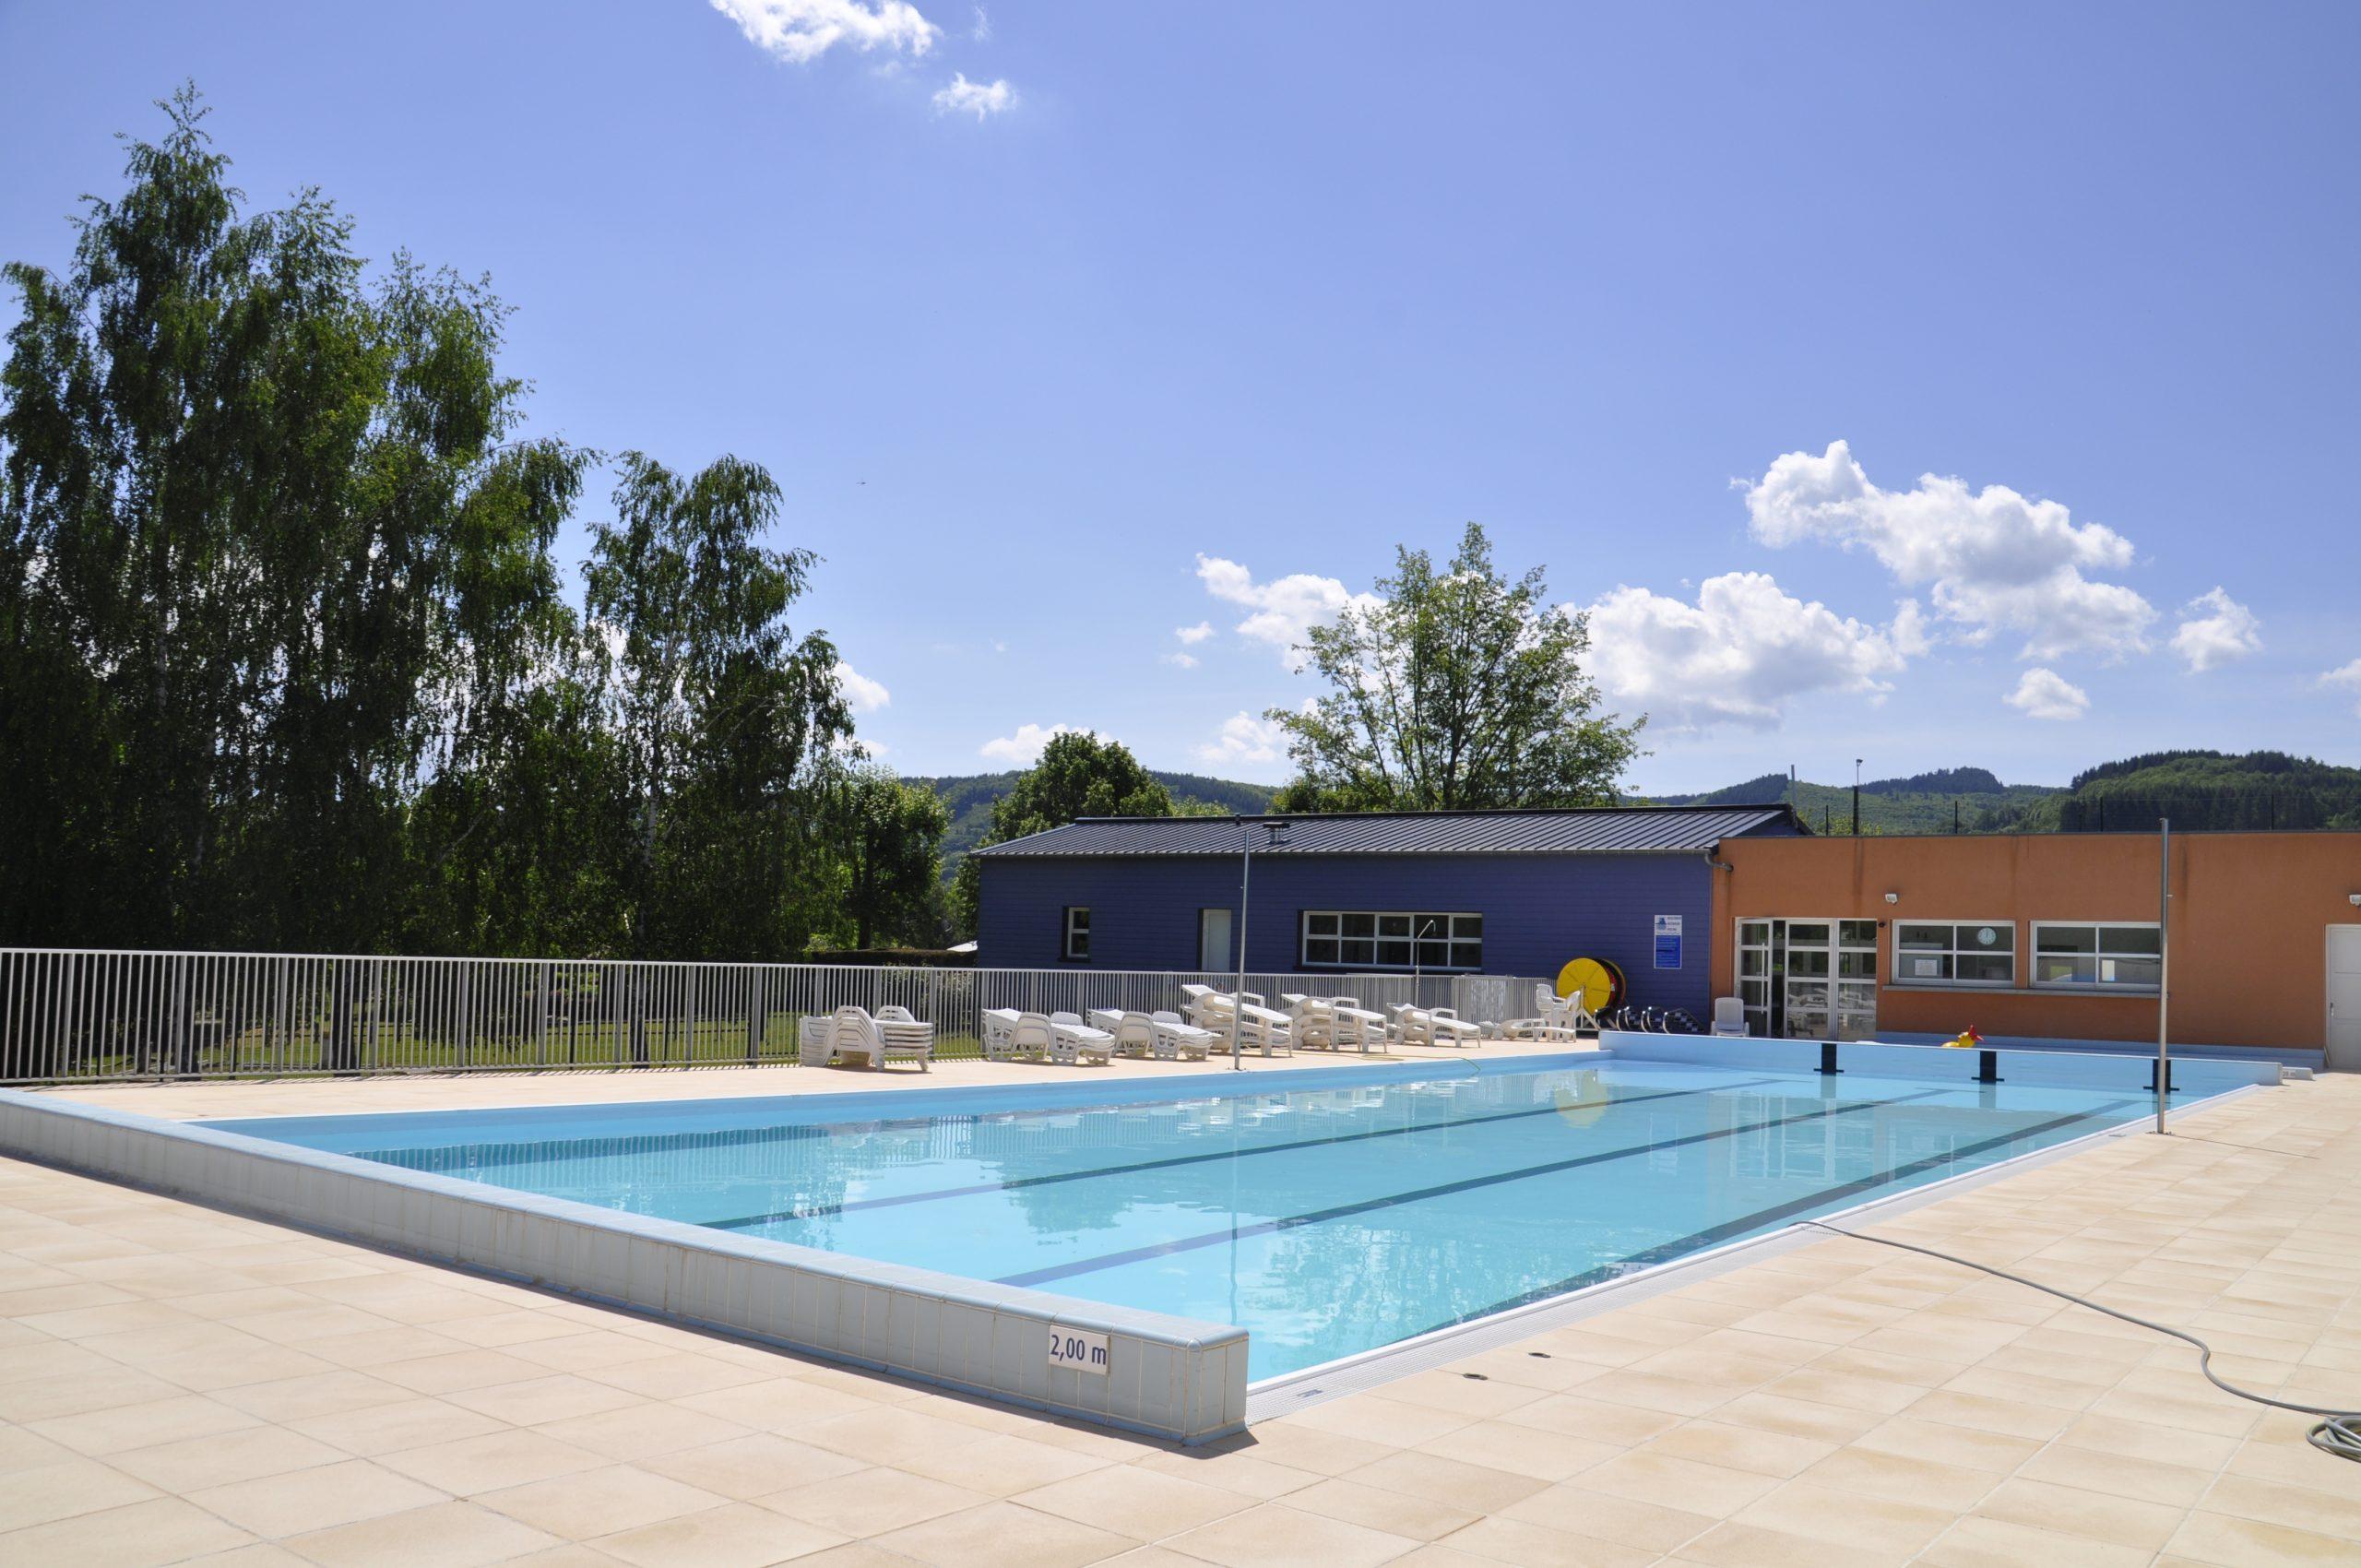 Piscine Du Mayet-De-Montagne - Stade Aquatique intérieur Piscine Bellerive Horaire